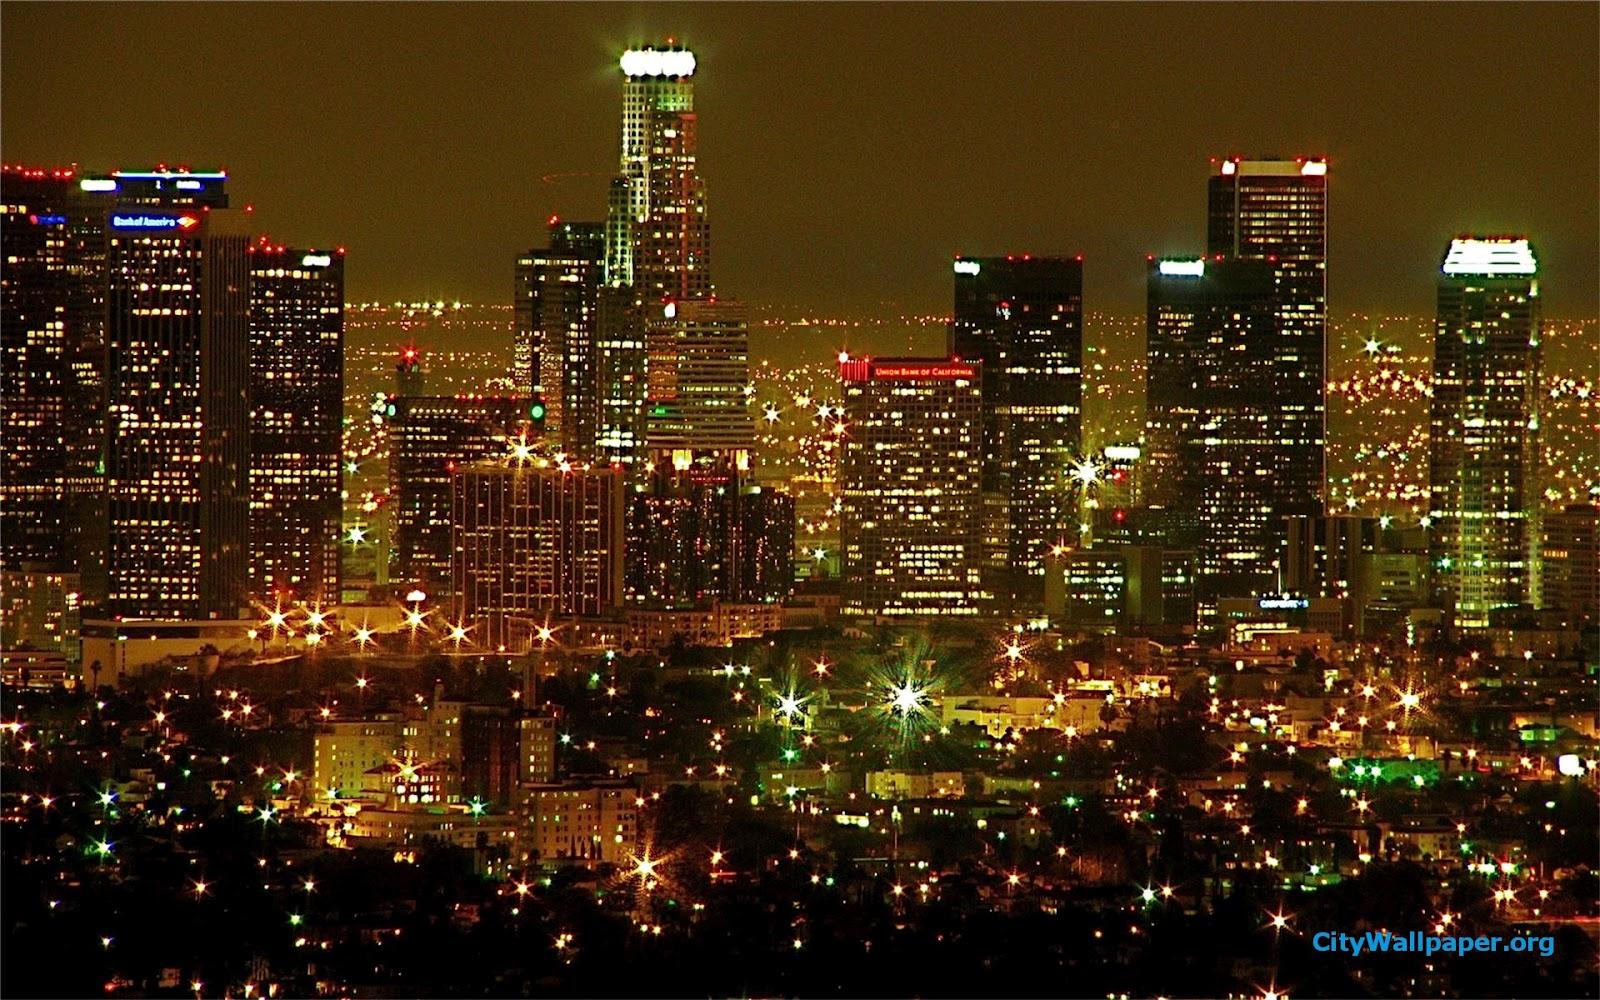 Round The World World Tourism Los Angeles Tourism Los Angeles Attractions Los Angeles Hotels